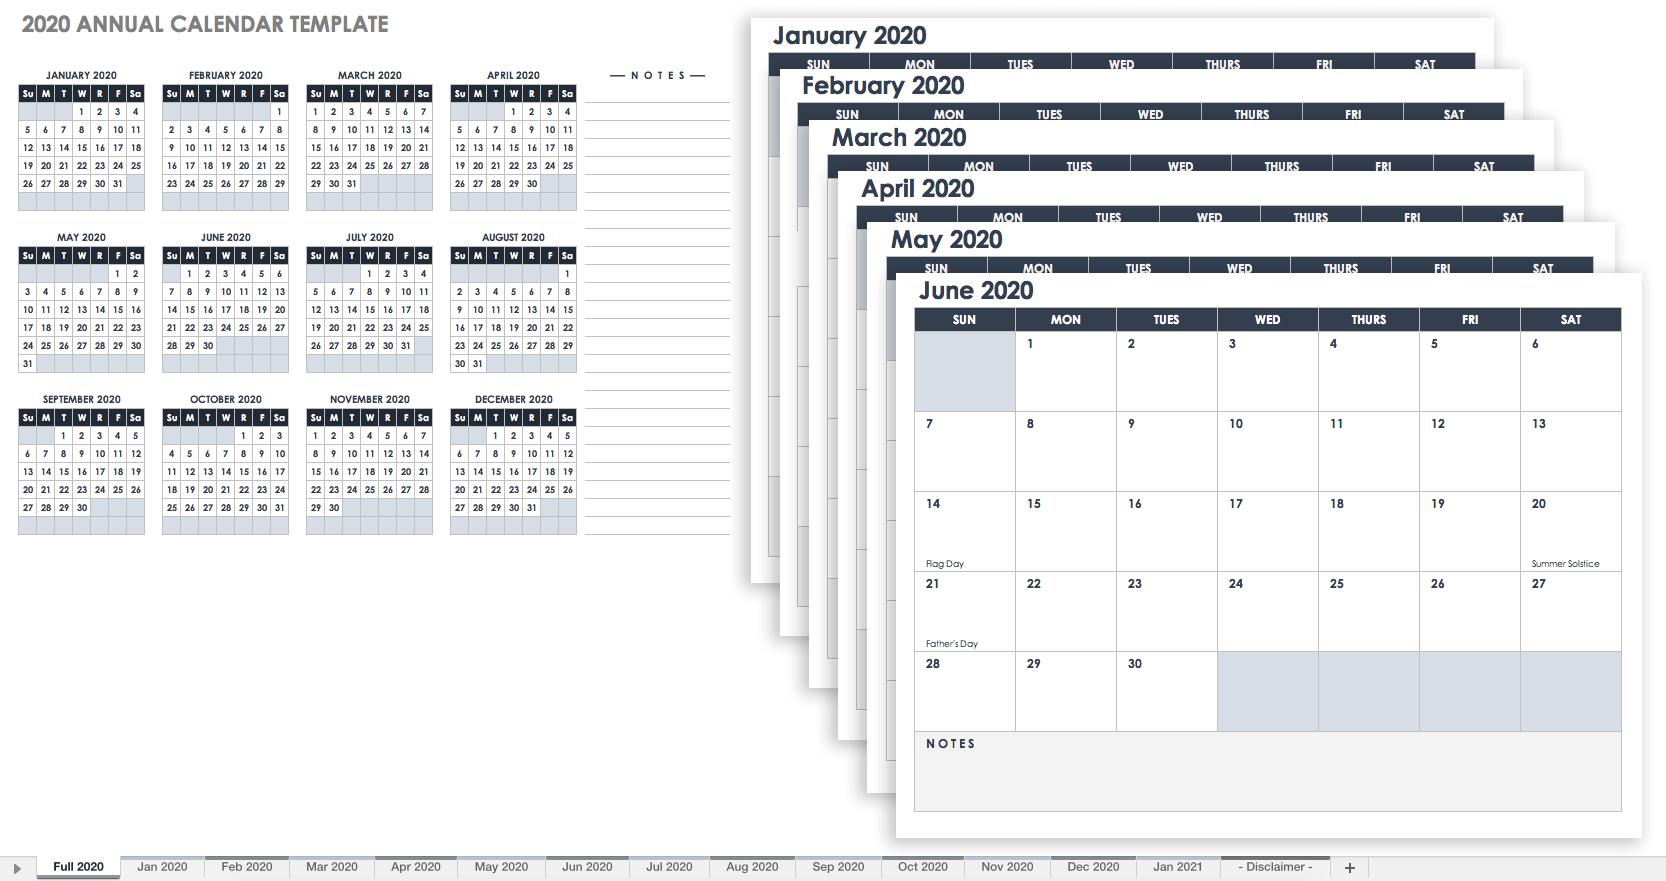 Free, Printable Excel Calendar Templates For 2019 & On | Smartsheet Calendar 2019 Excel Australia